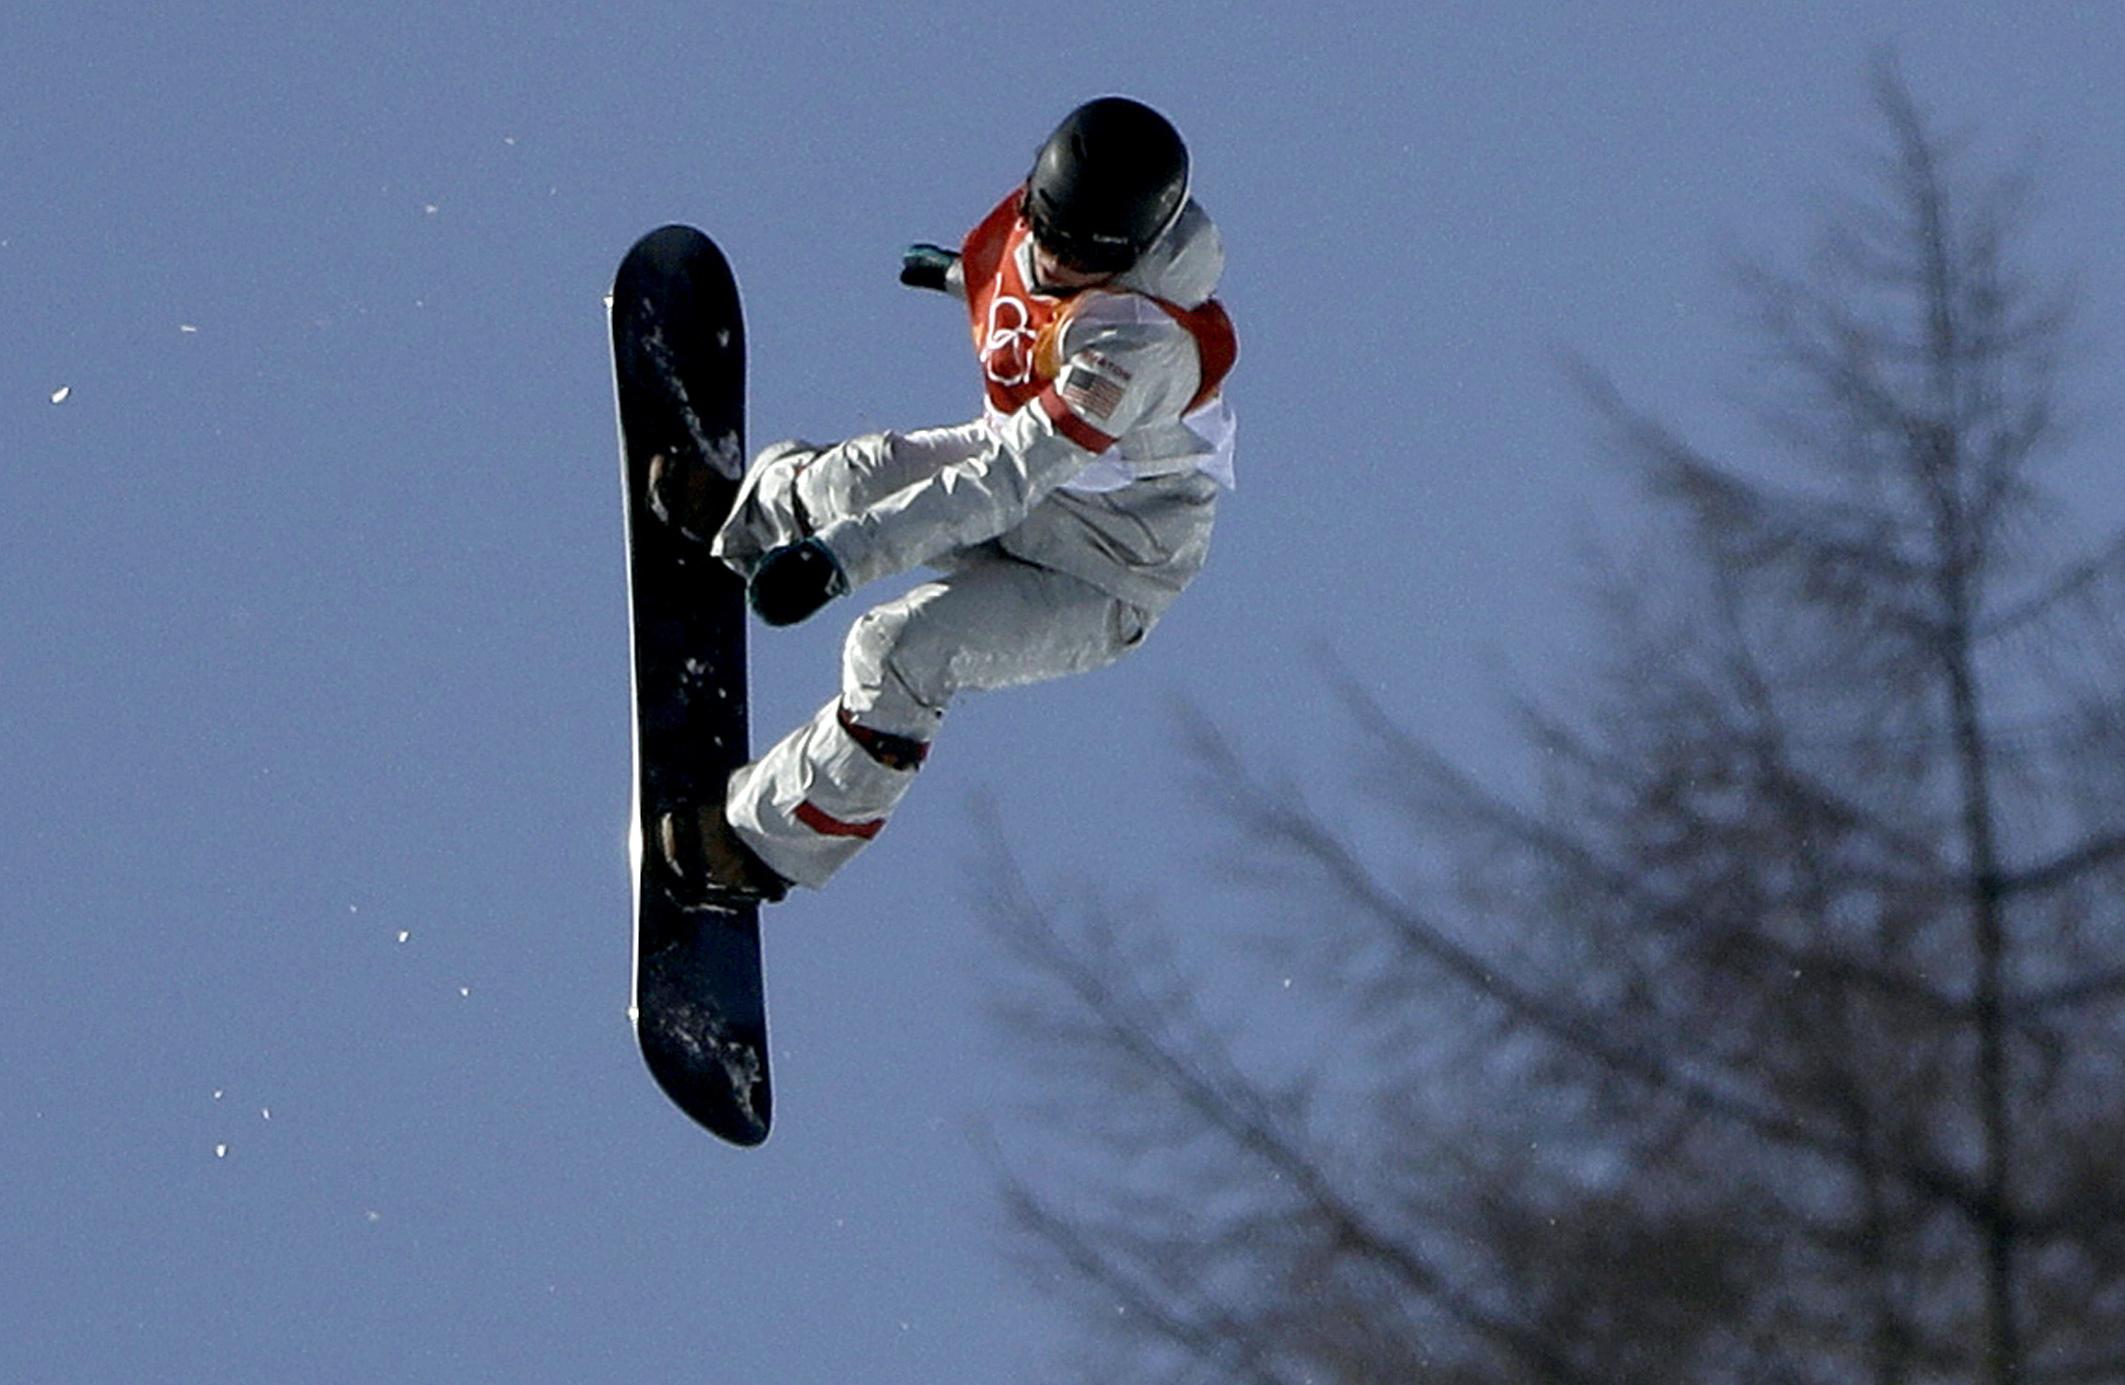 Photo: Arielle Gold Snowboard 2018 Winter Olympics (AP)